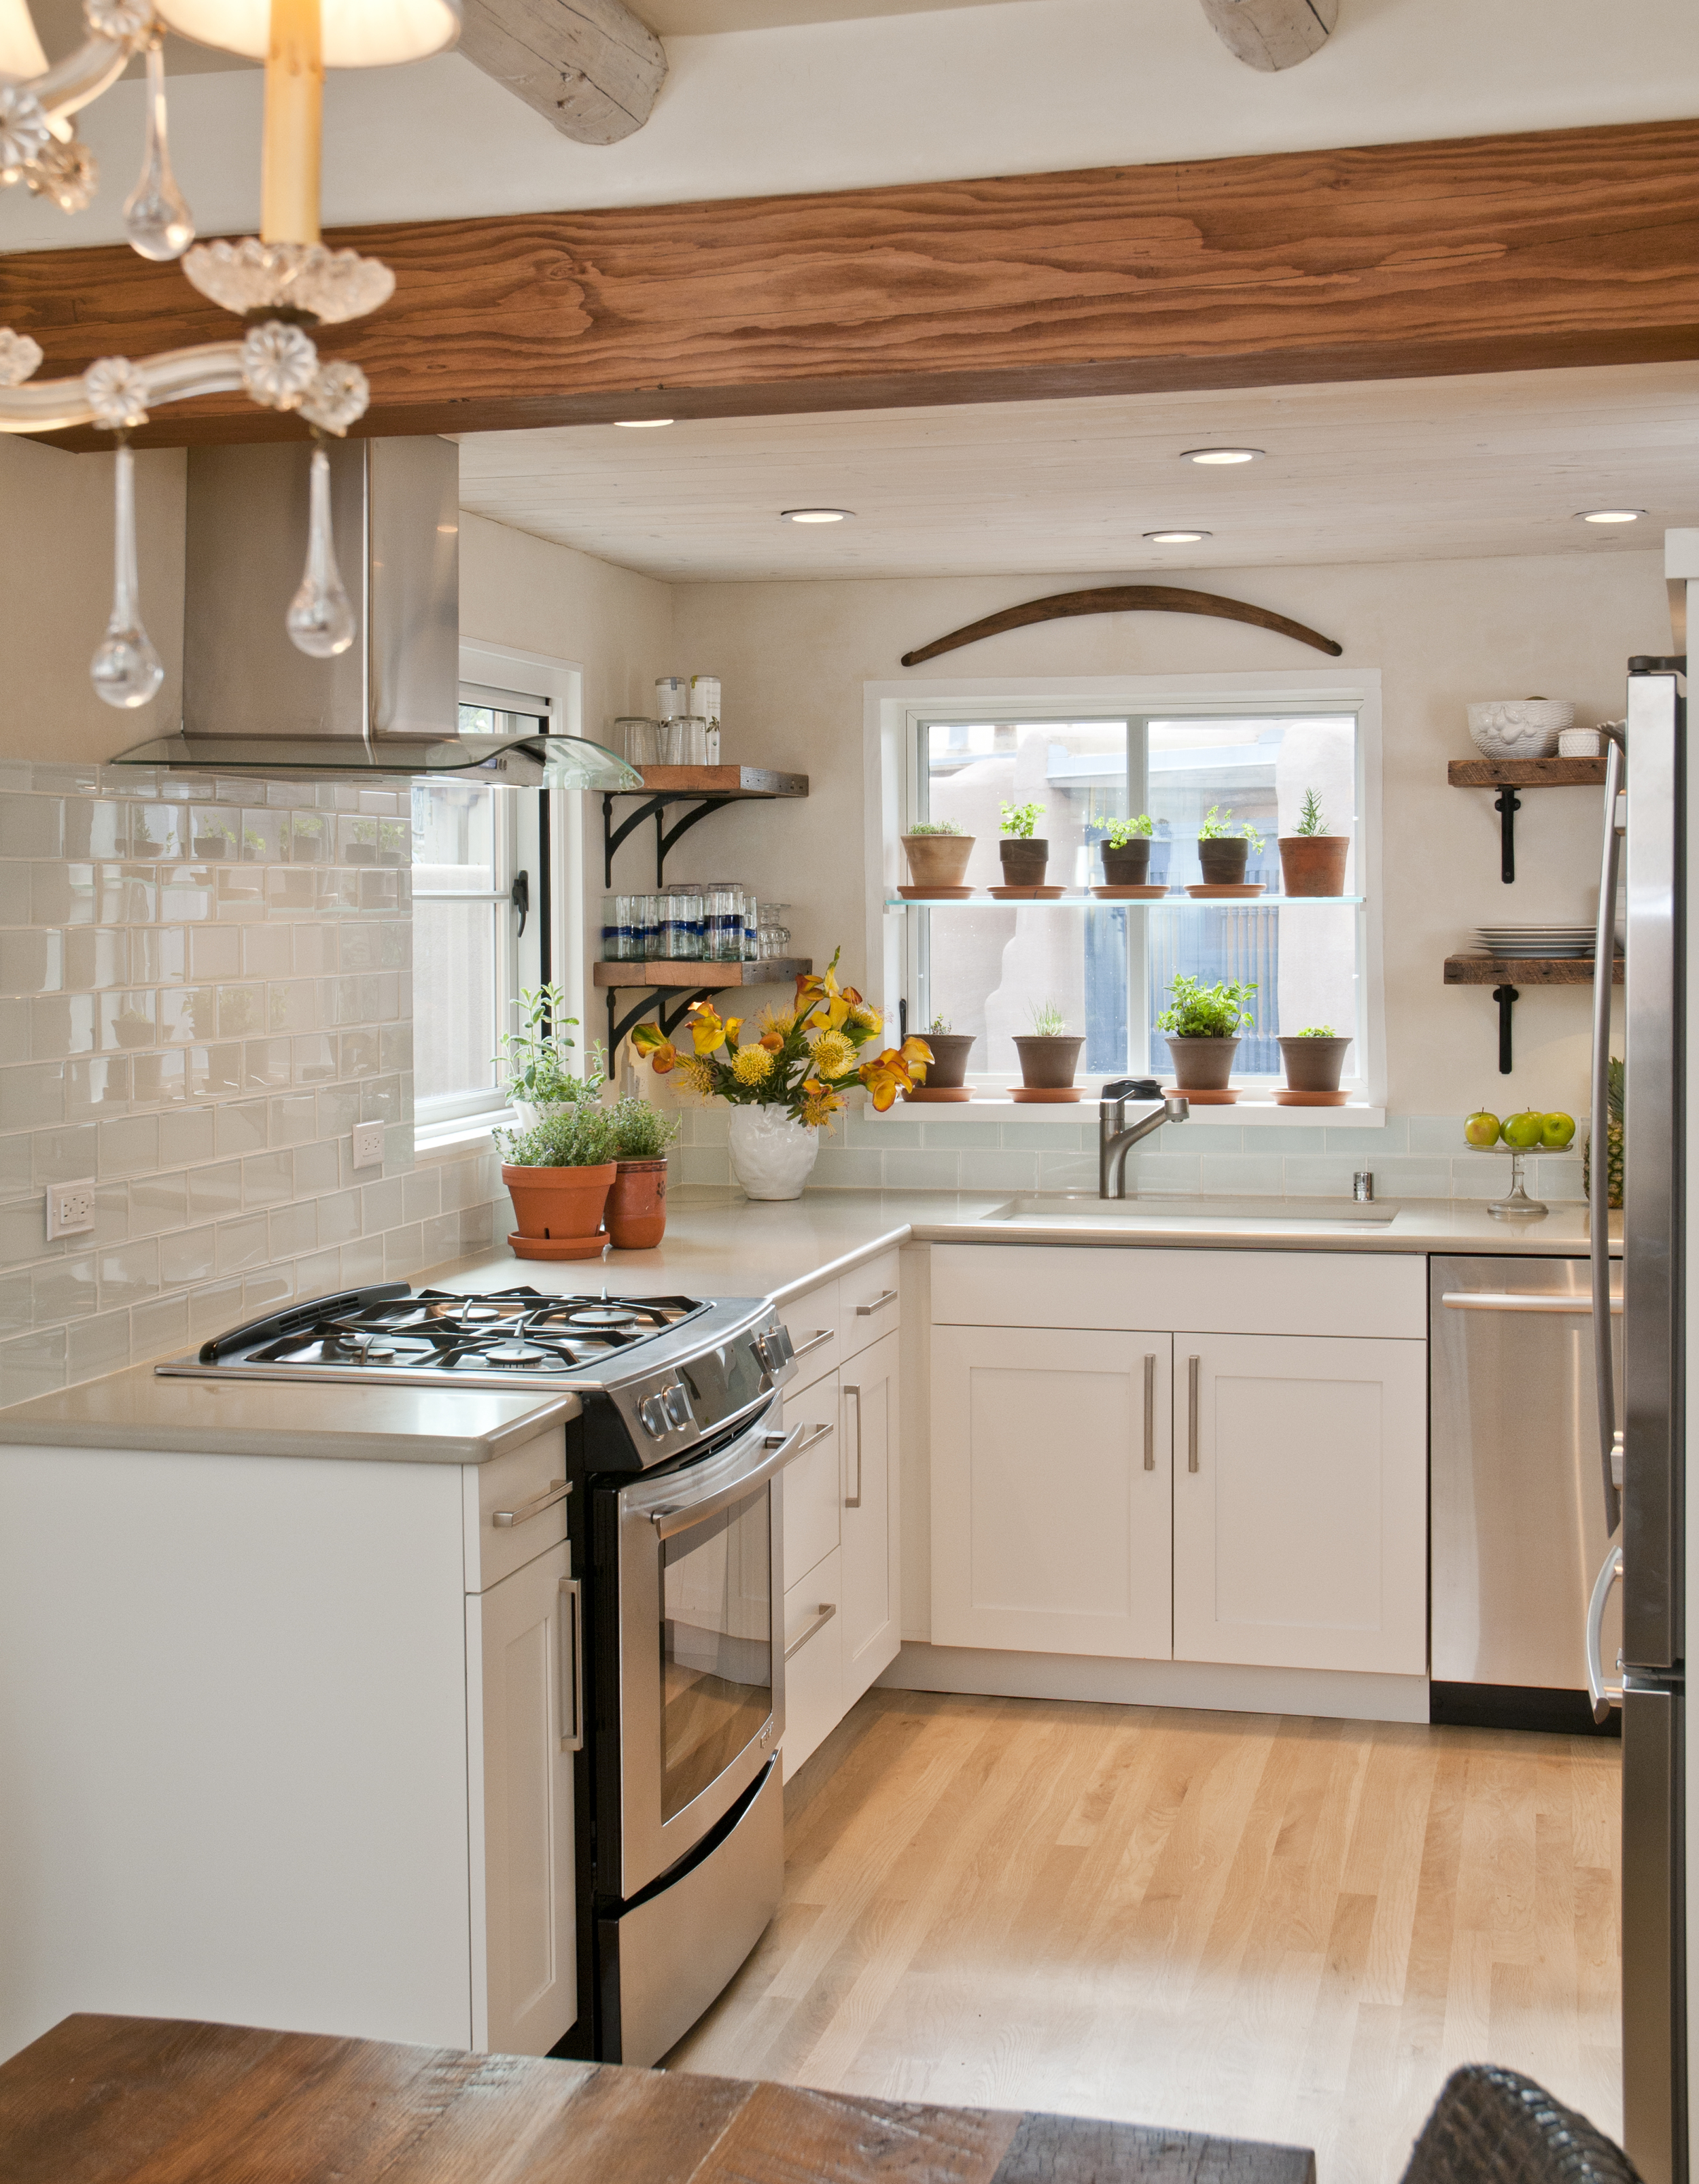 Santa Fe Historic Cottage Kitchen- photo by Laurie Allegretti.jpeg